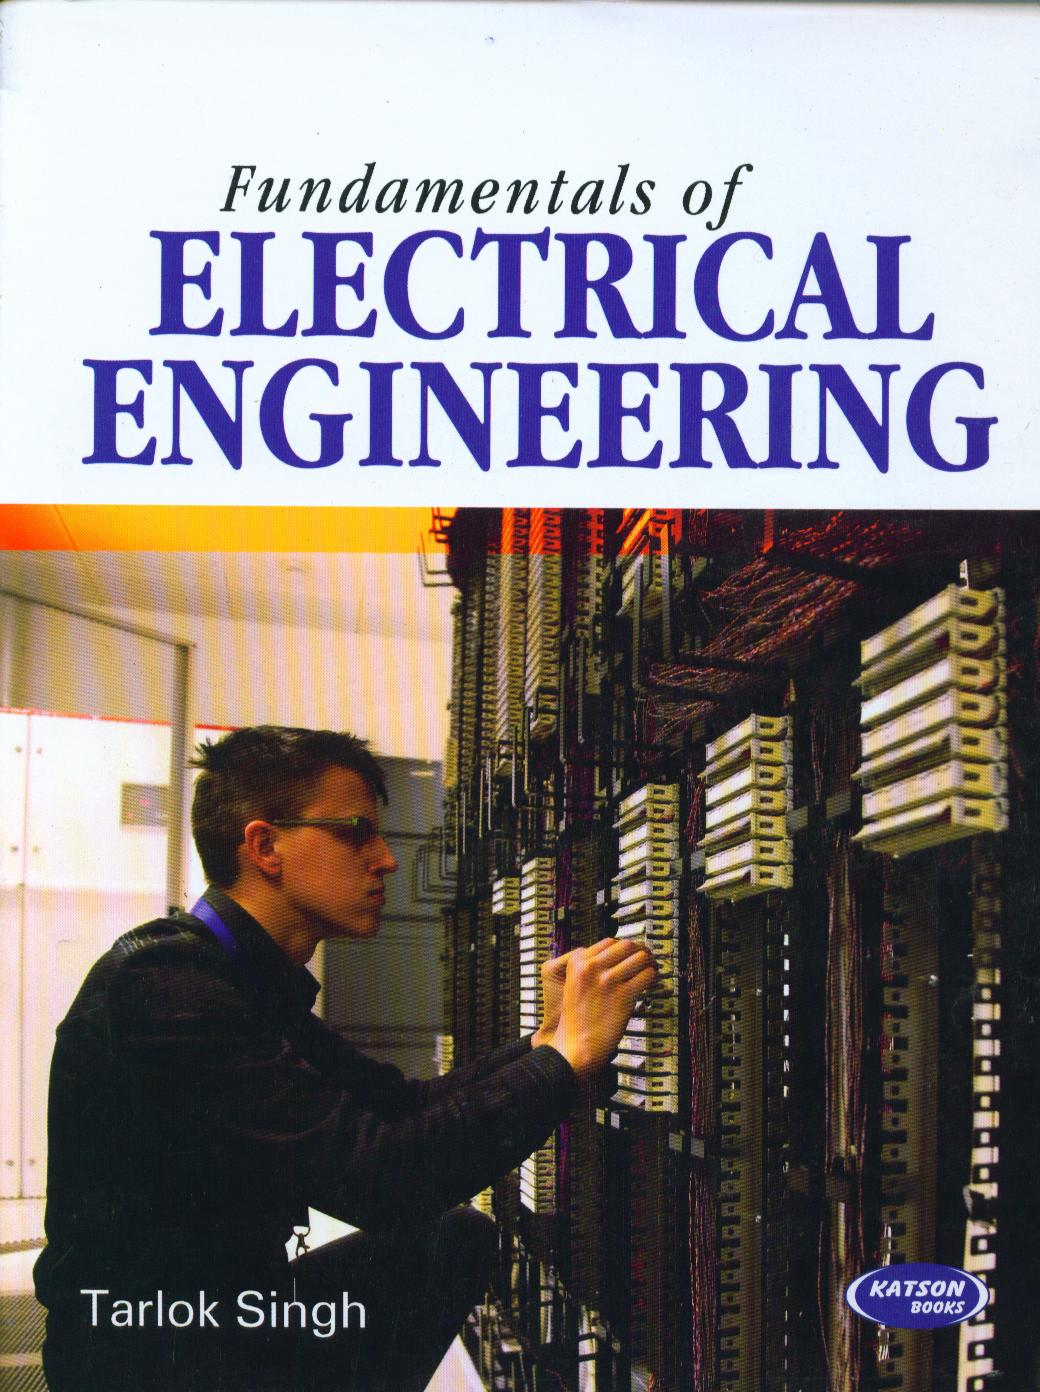 Buy Fundamentals Of Electrical Engineering Book Tarlok Singh